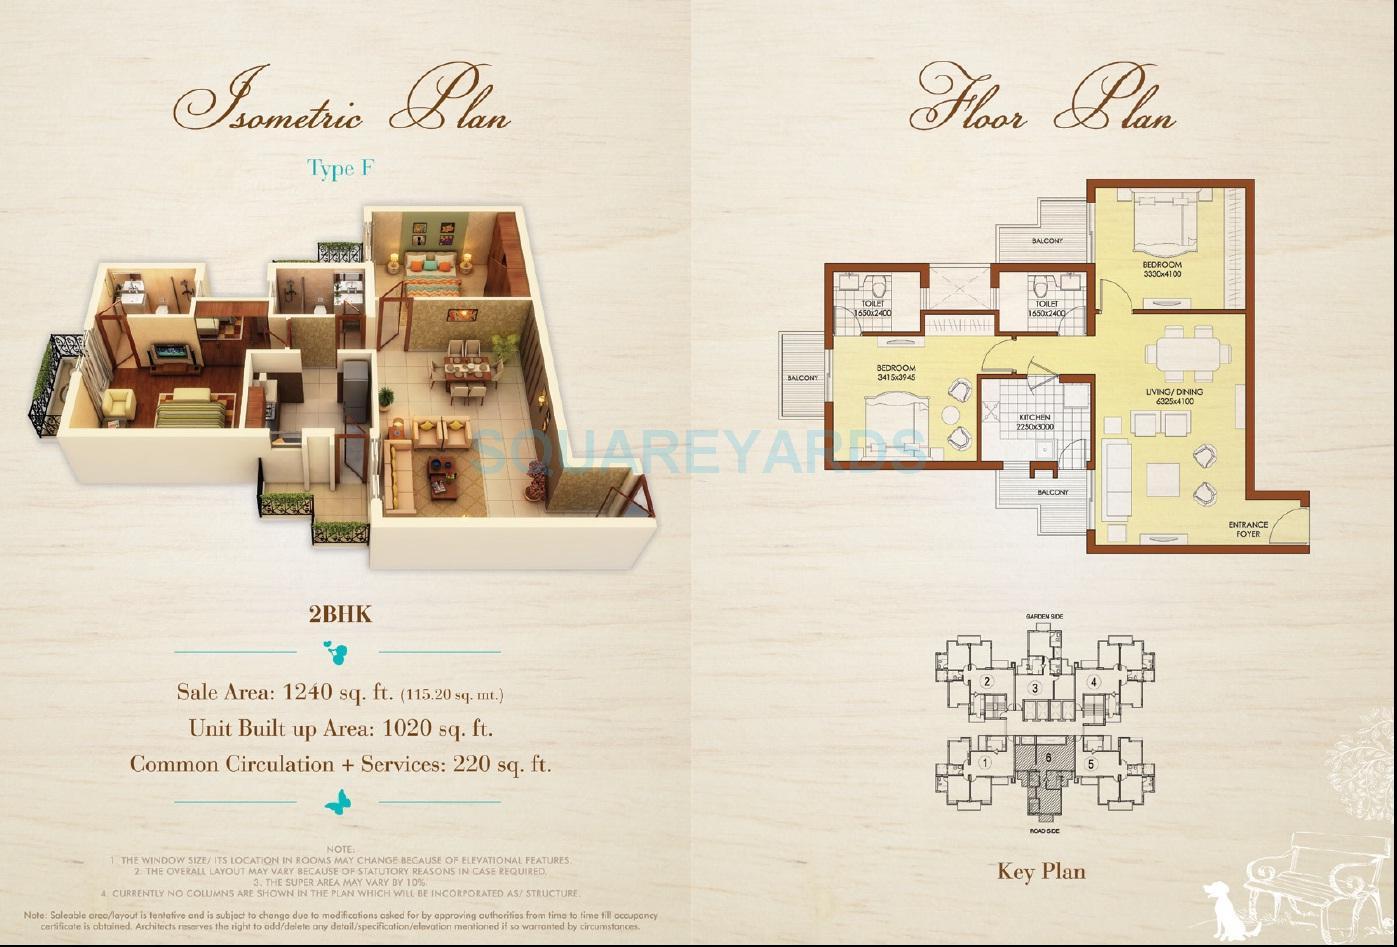 ats dolce apartment 2bhk 1240sqft 1